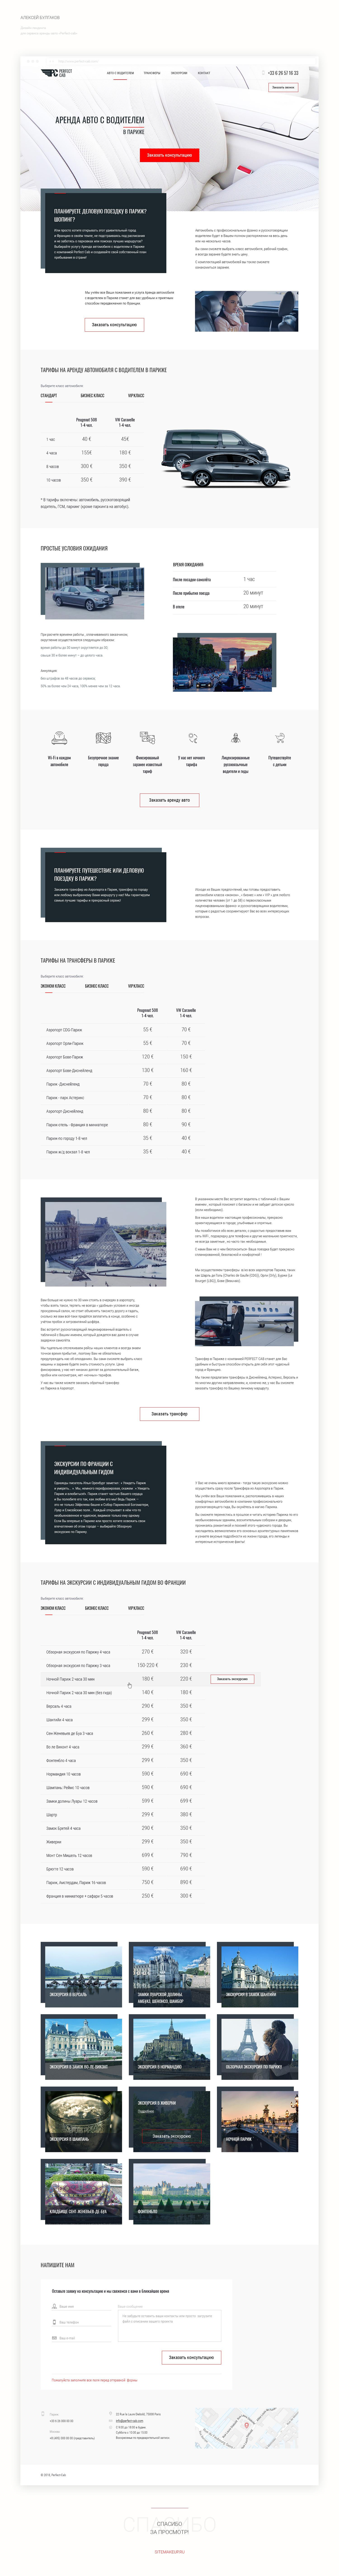 Дизайн лендинга для сервиса аренды авто «Perfect-cab»